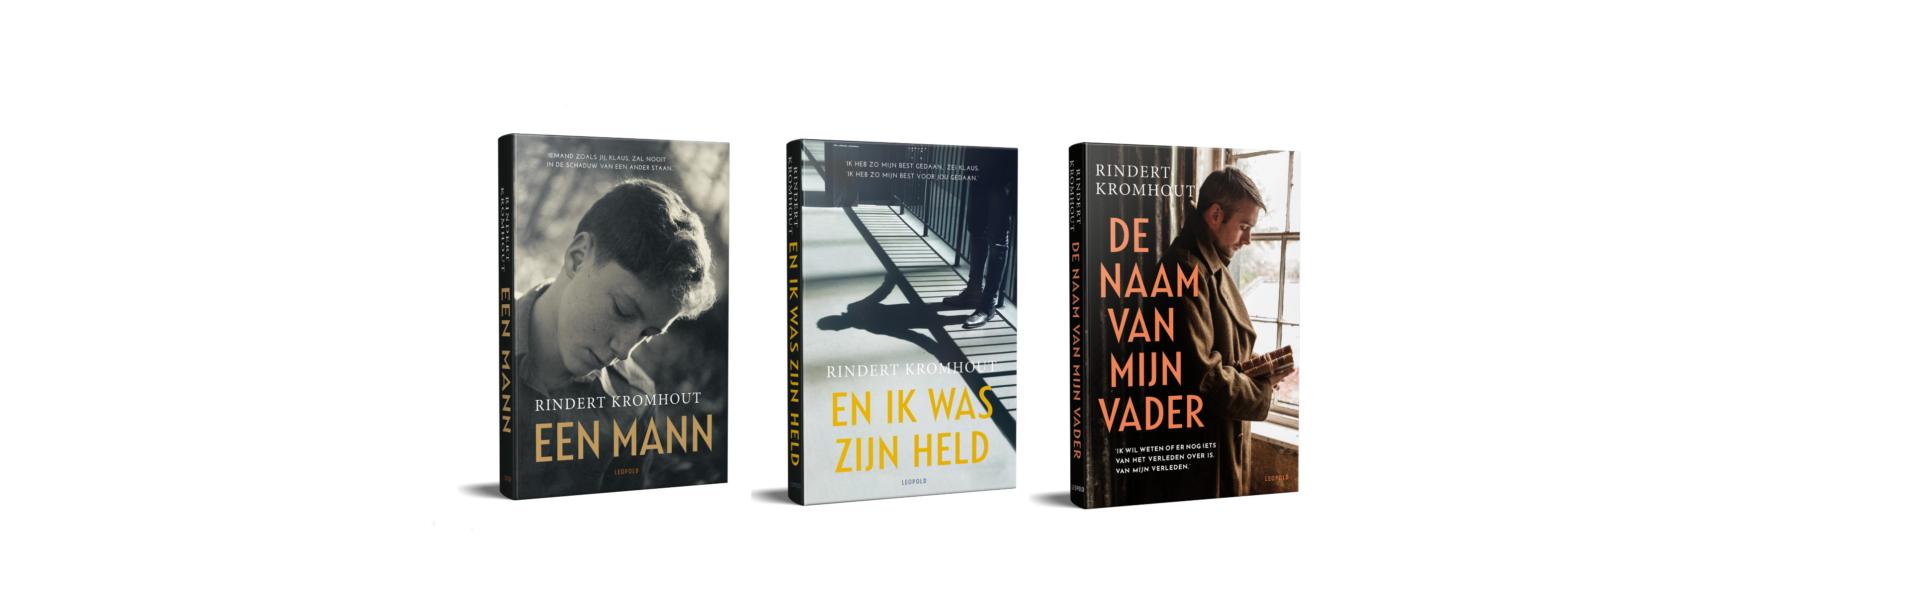 Klaus Mann trilogie - Rindert Kromhout